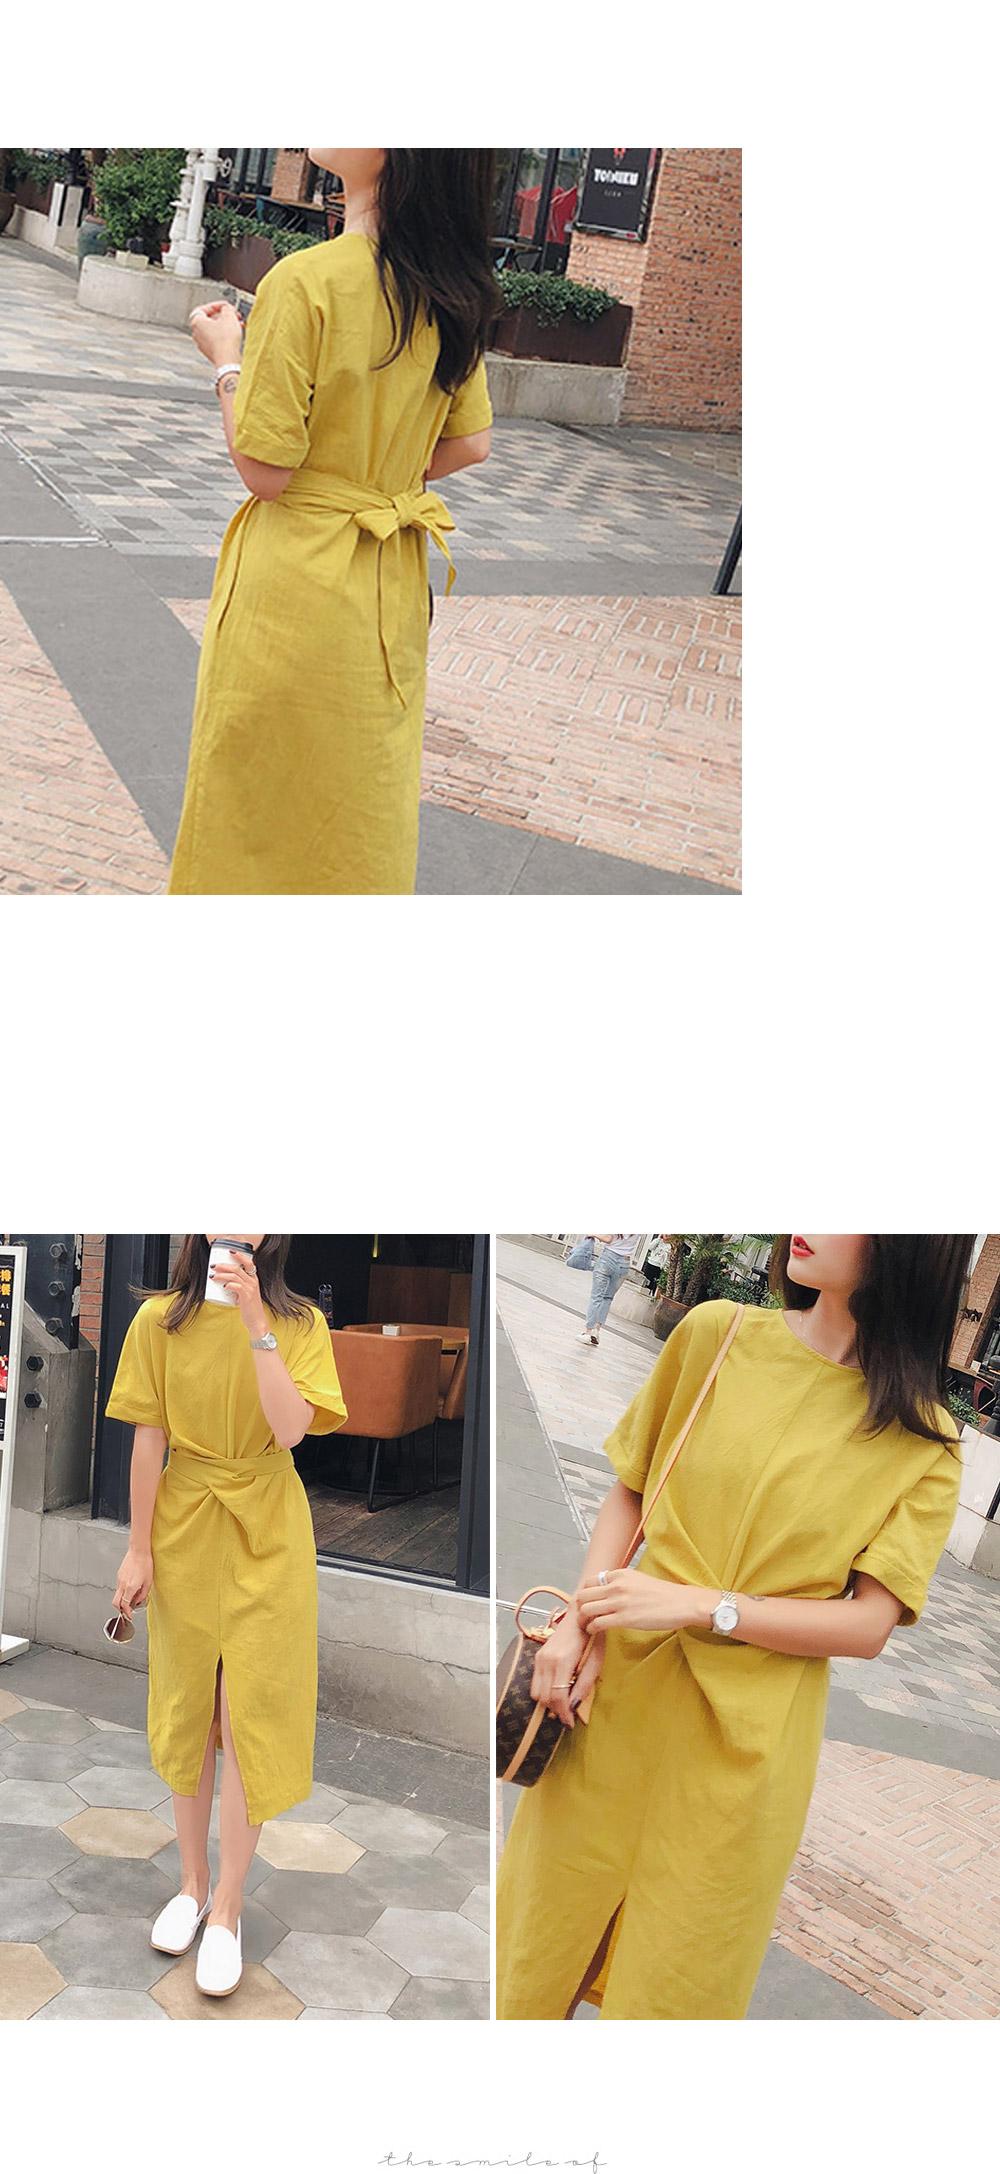 Tangerine linen twisted dress